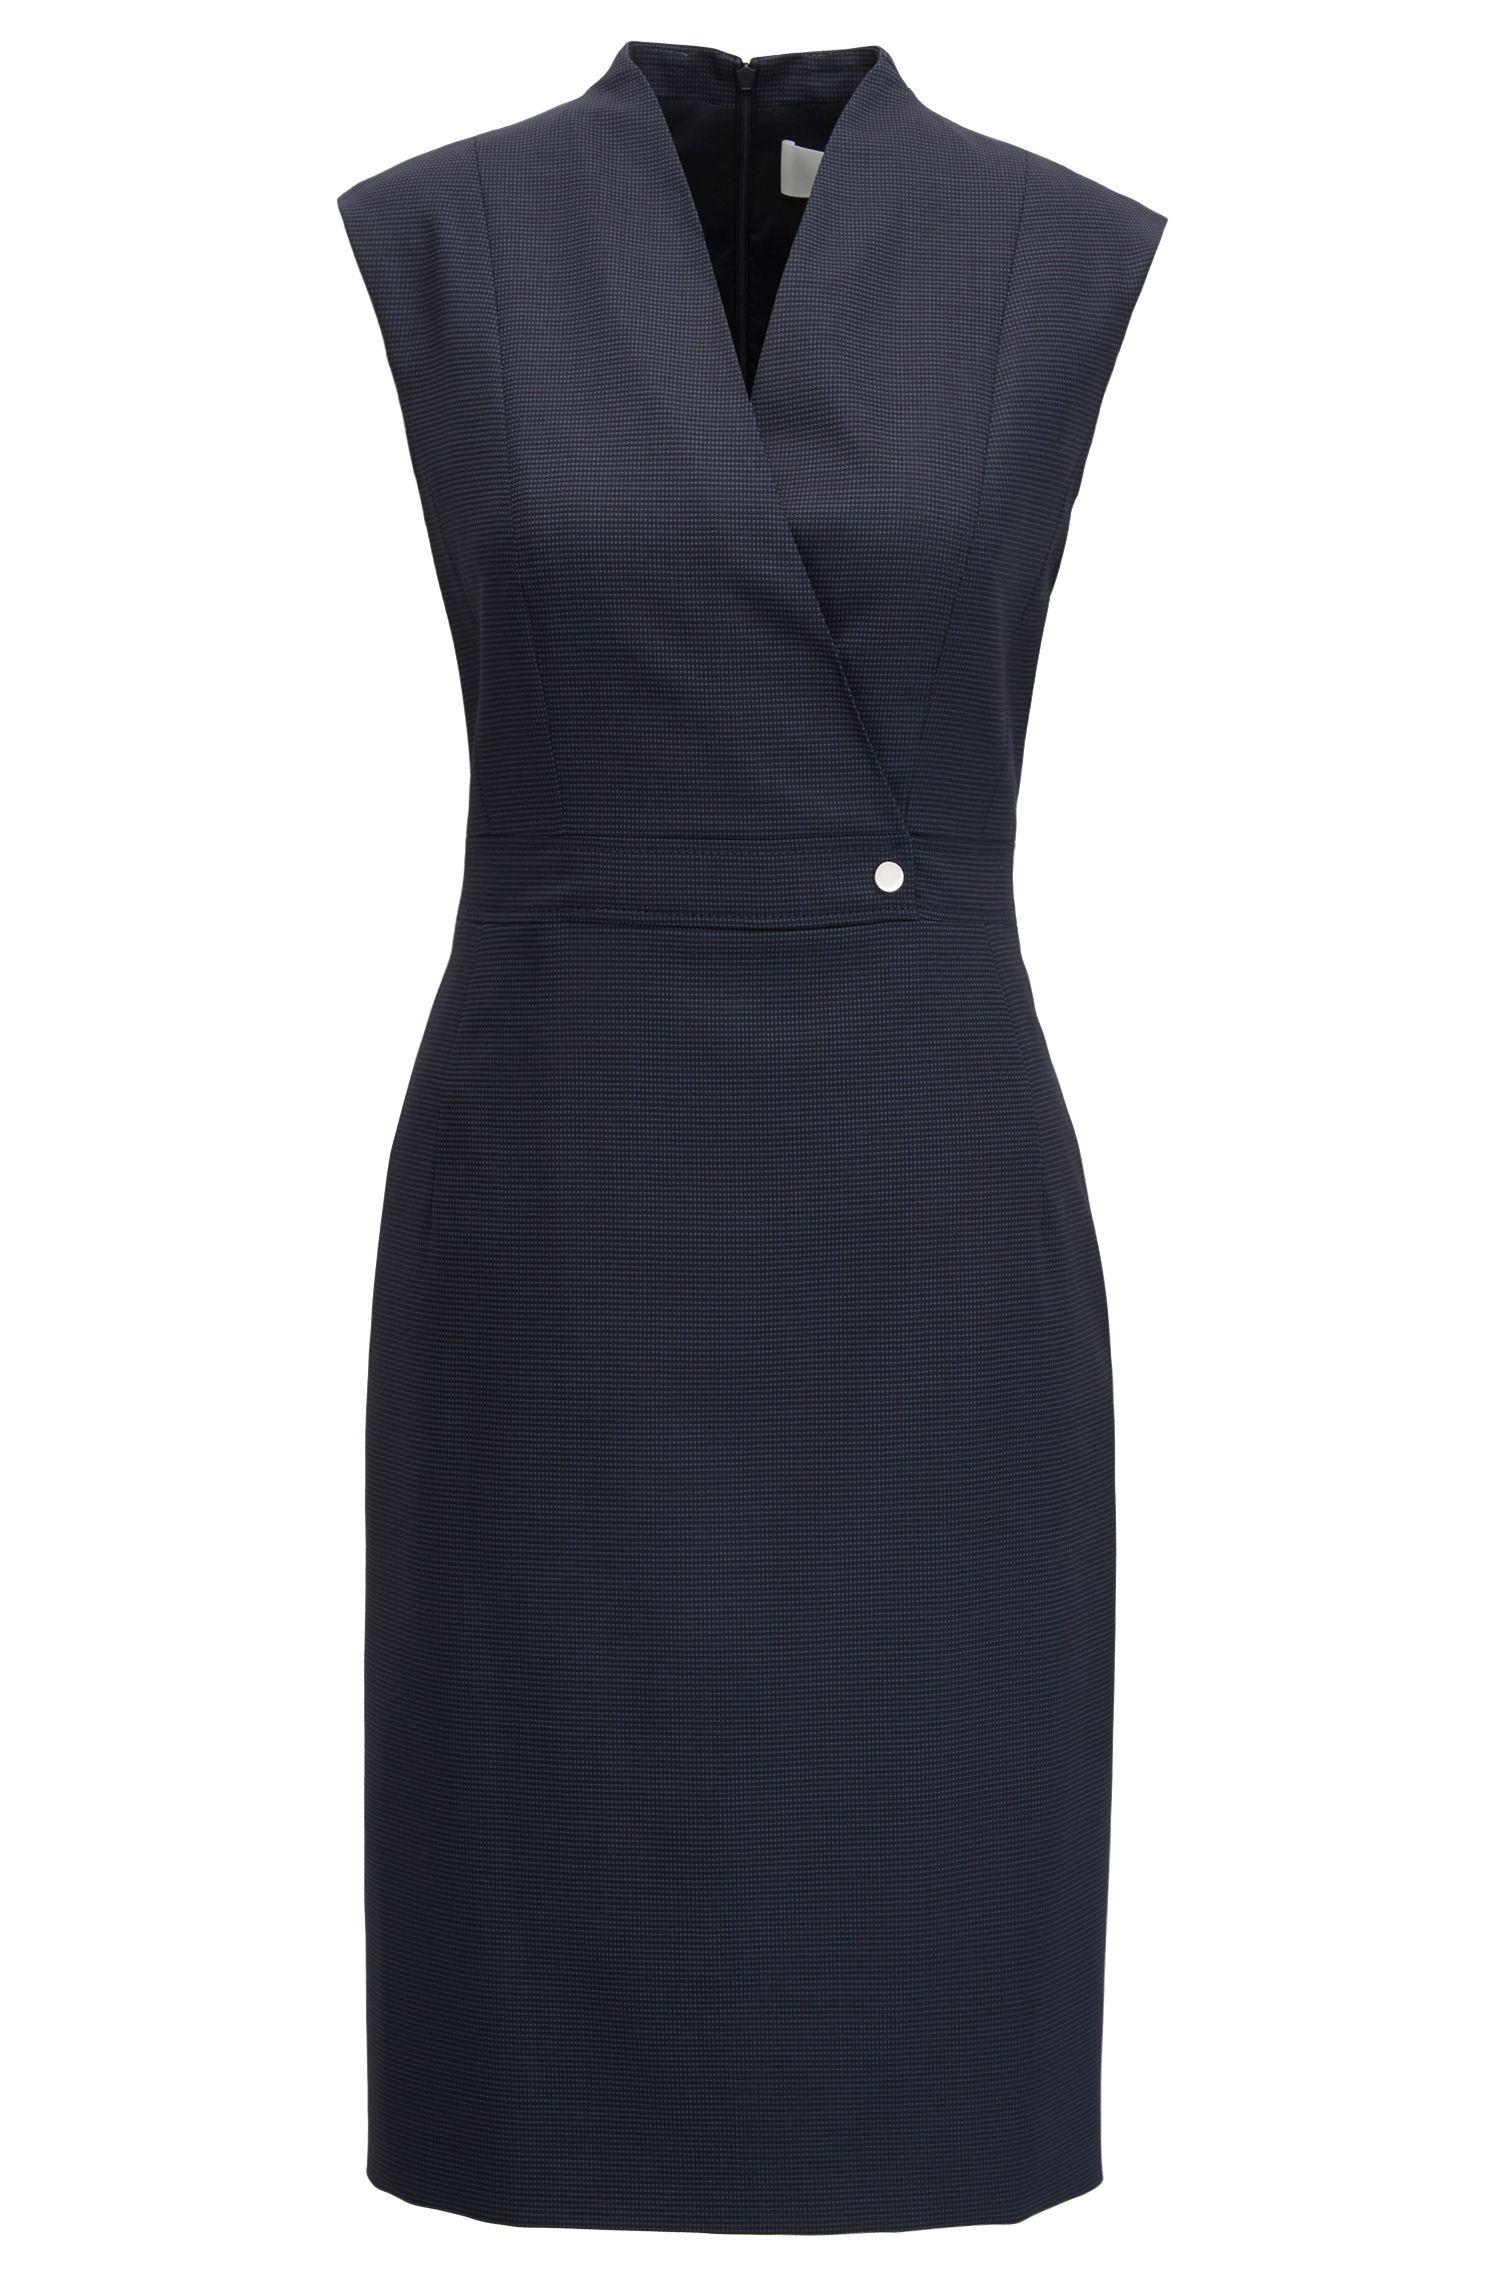 Shift dress in micro-patterned stretch virgin wool